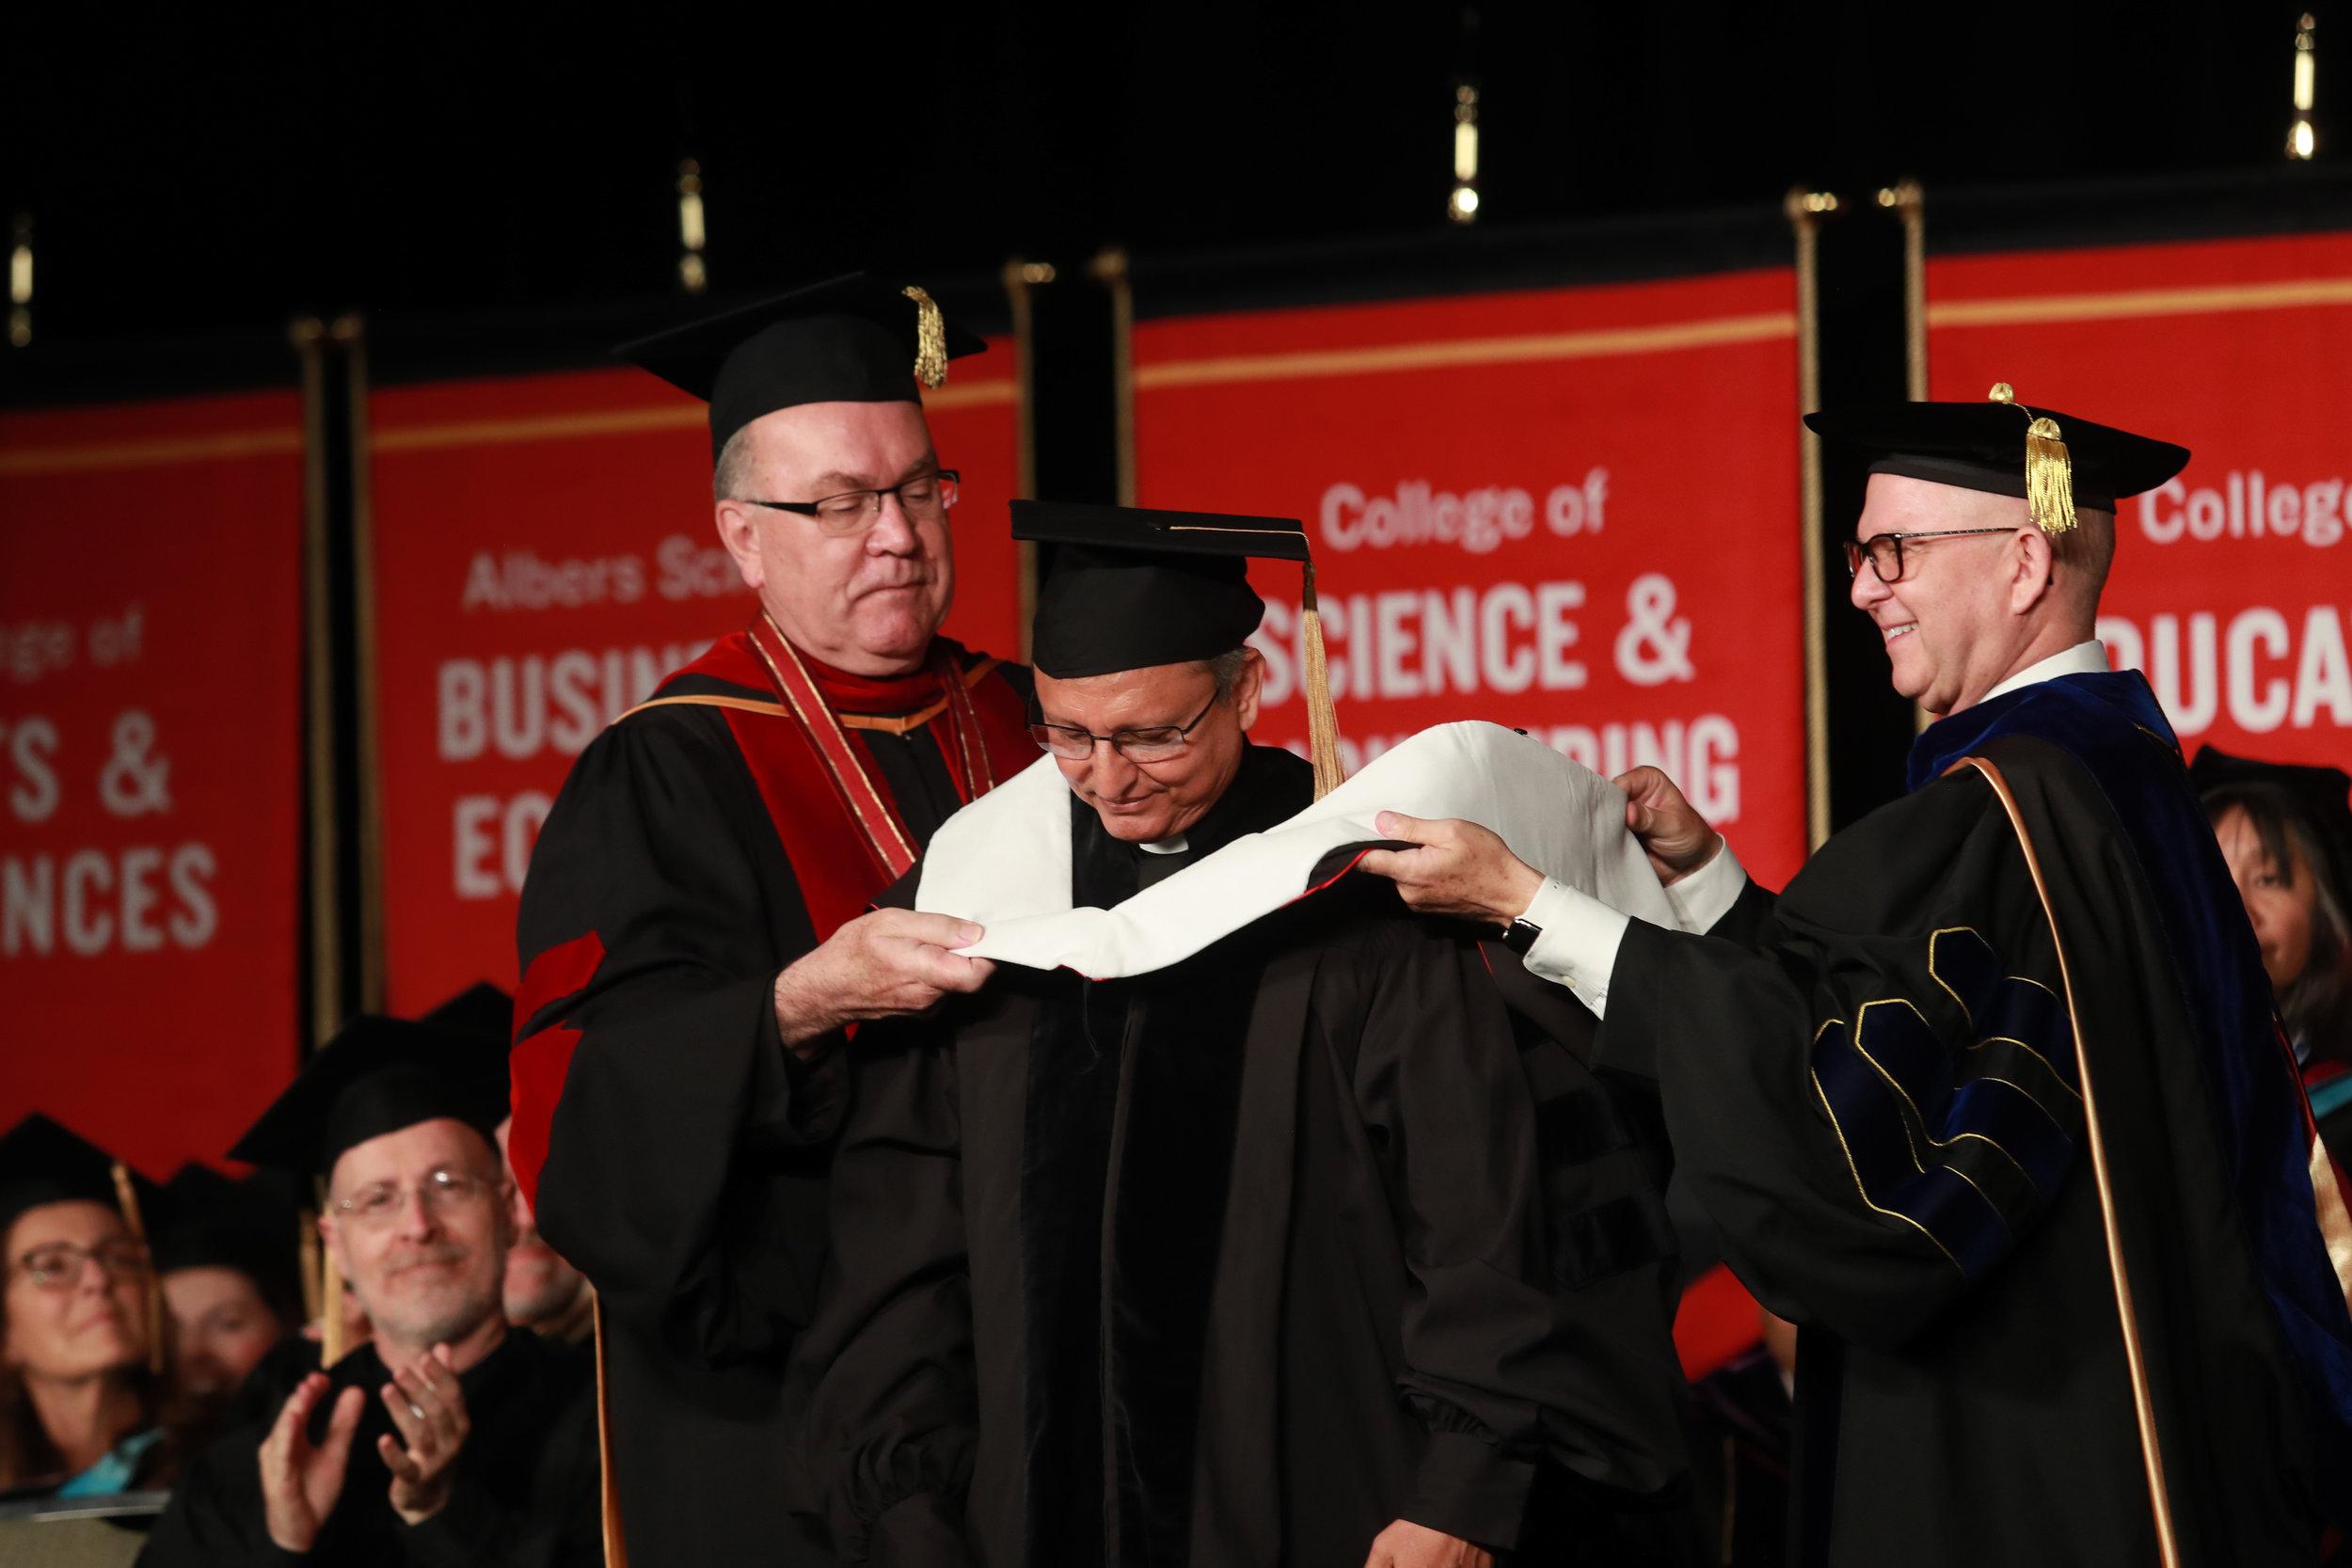 "Rev. Stephen Sundborg, S.J. (President of Seattle University) & Dr. Shane Martin (provost of SU) confer an honorary degree to Rev. José Alberto ""Chepe"" Idiaquez, S.J. (Photo by Seattle University/Yosef Kalinko)"